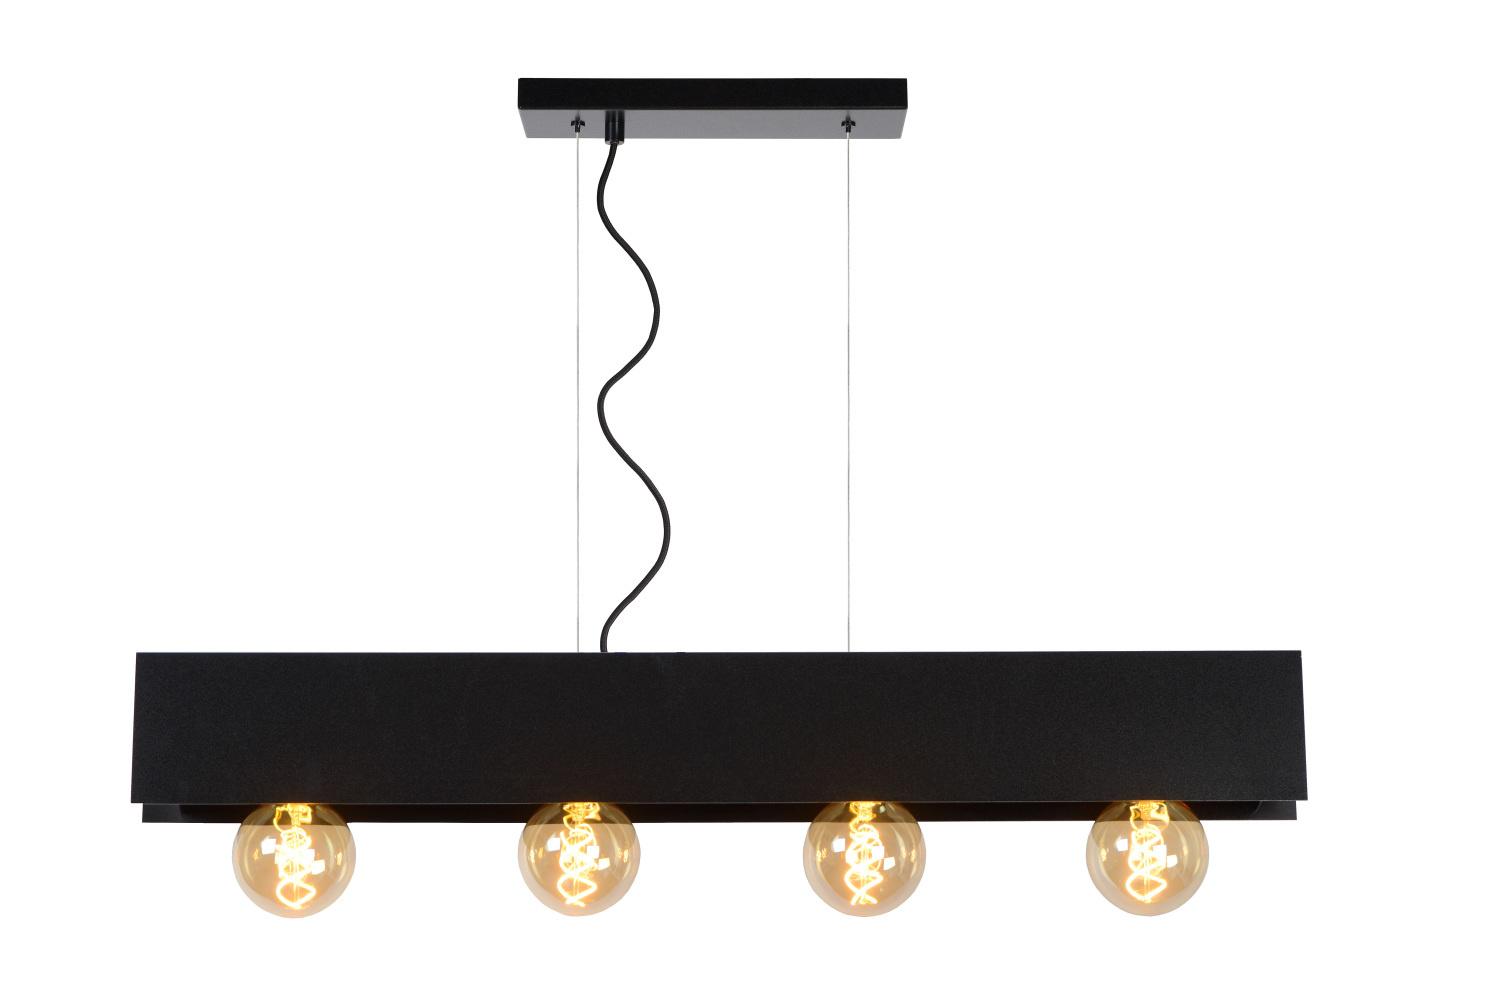 Lucide SURTUS Hanglamp 4xE27/60W Zwart